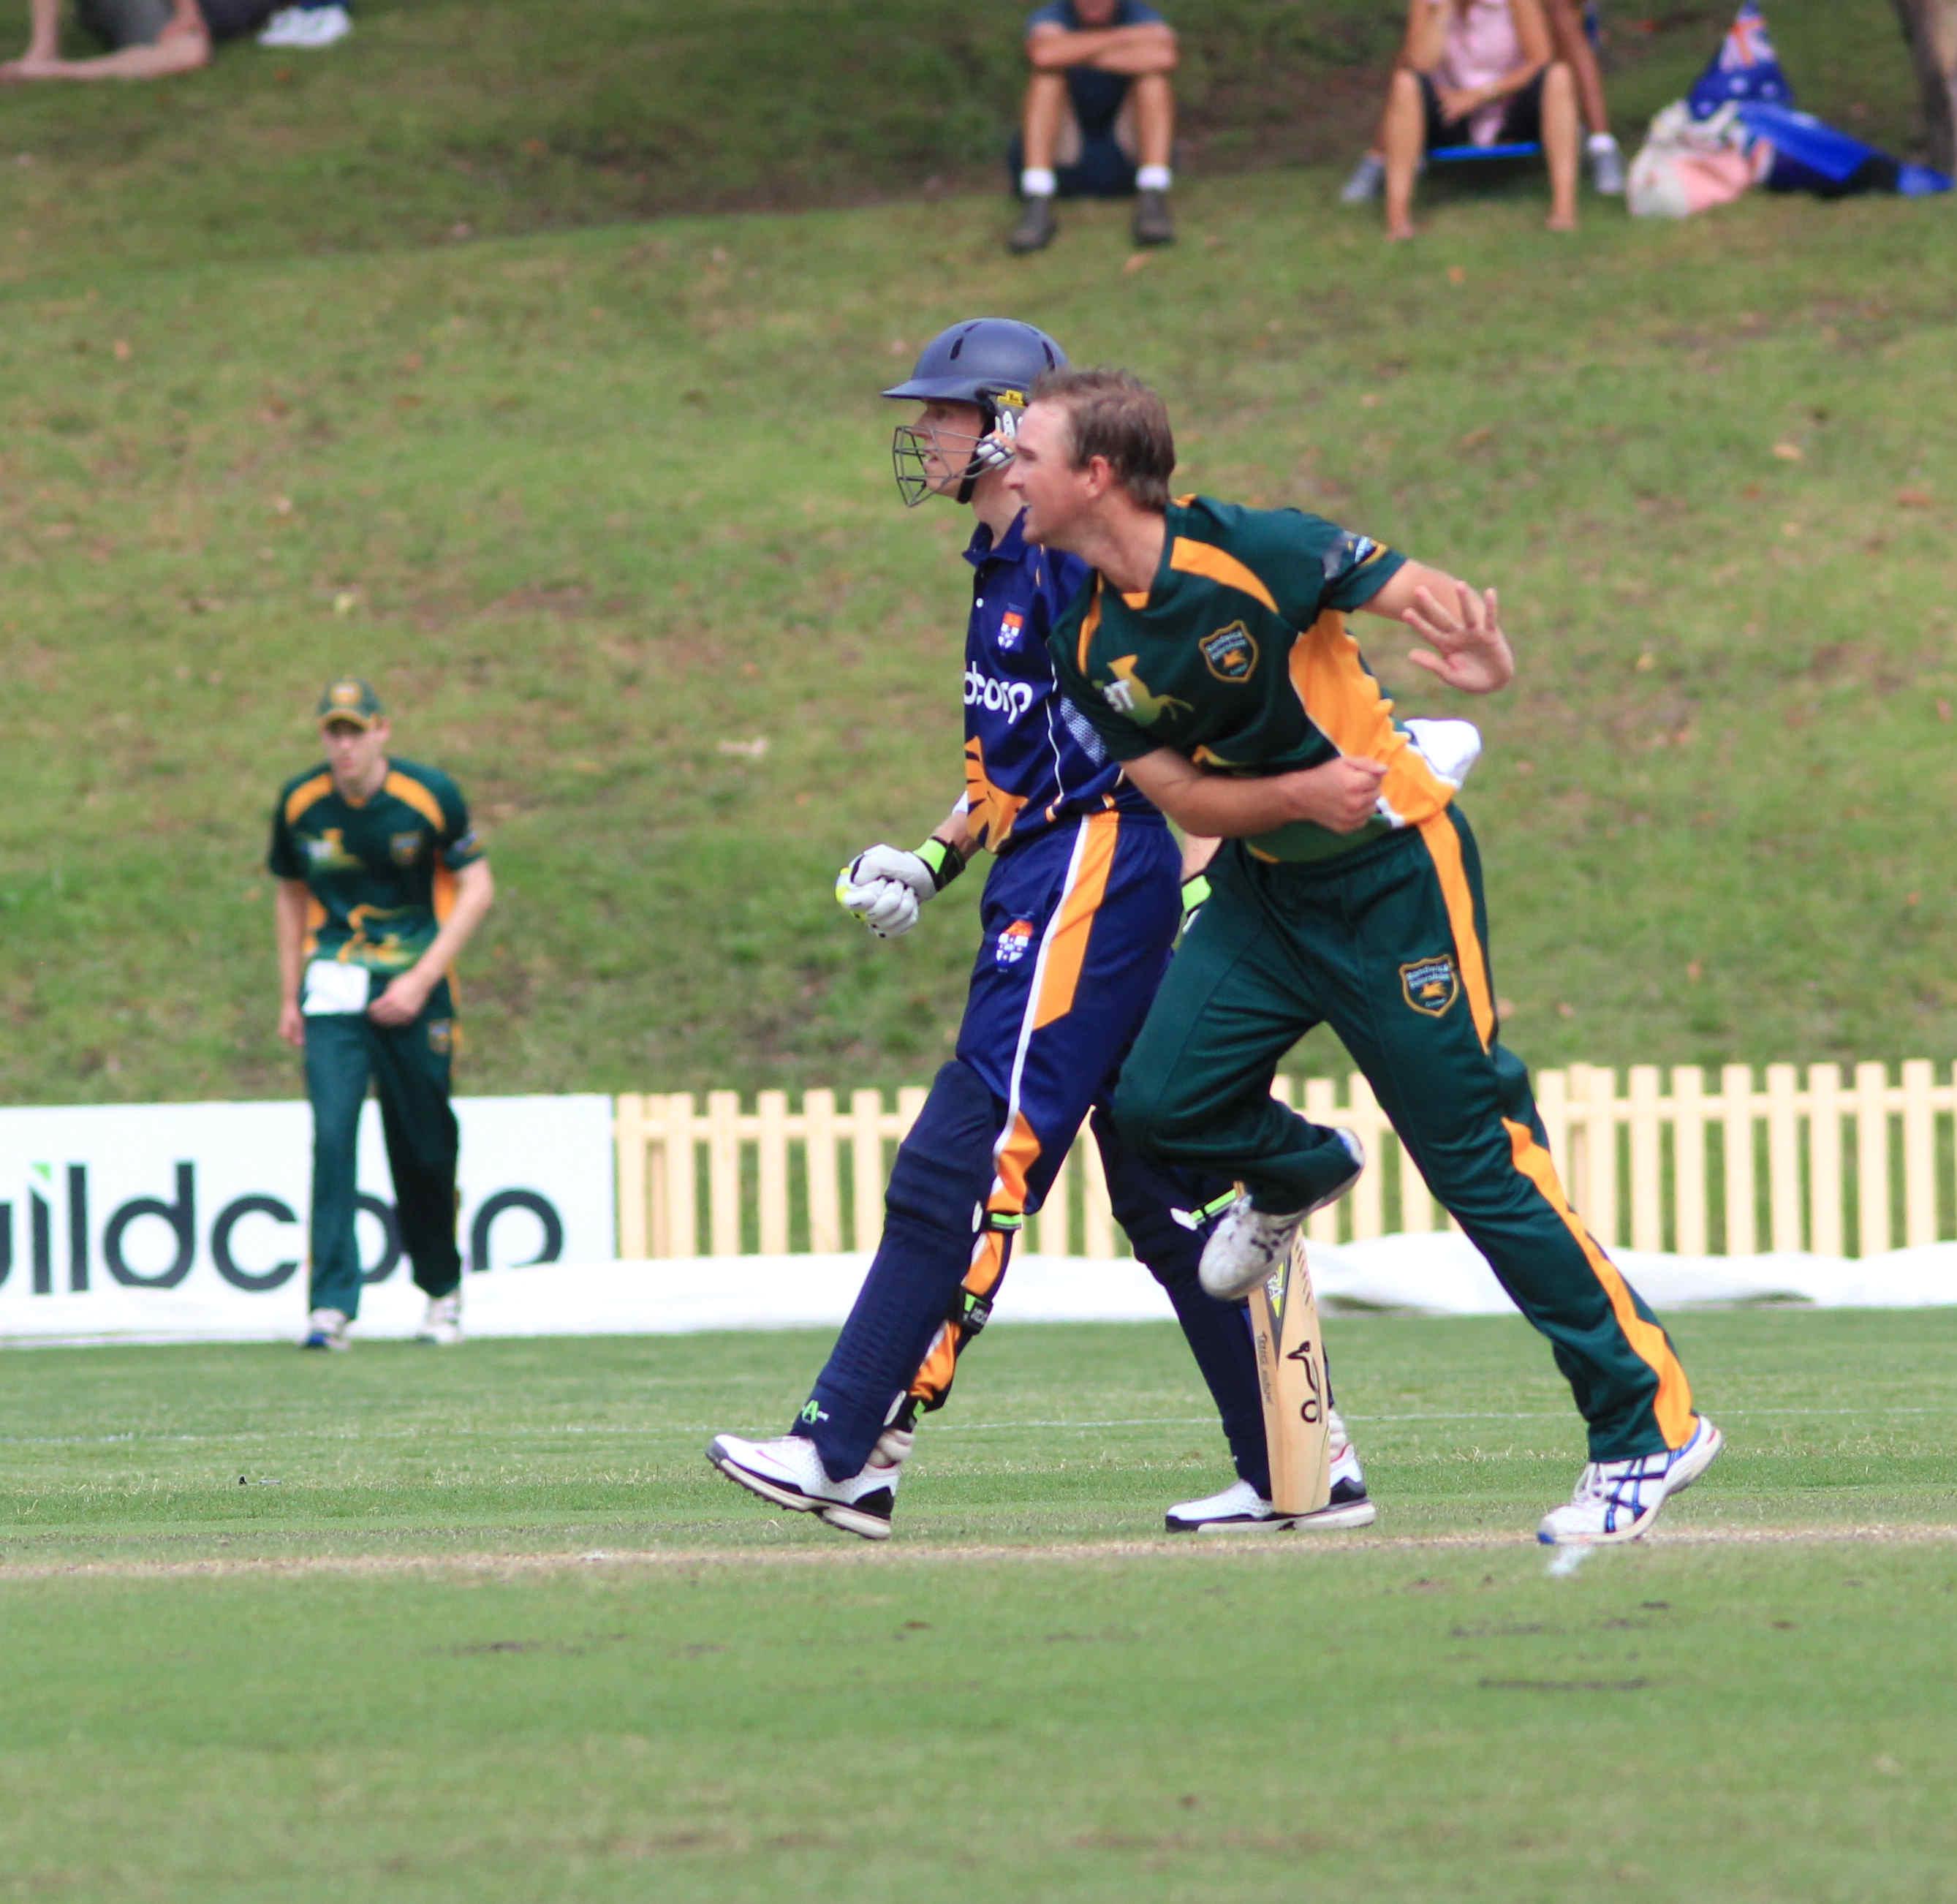 Nathan Hauritz - NSW Cap #703